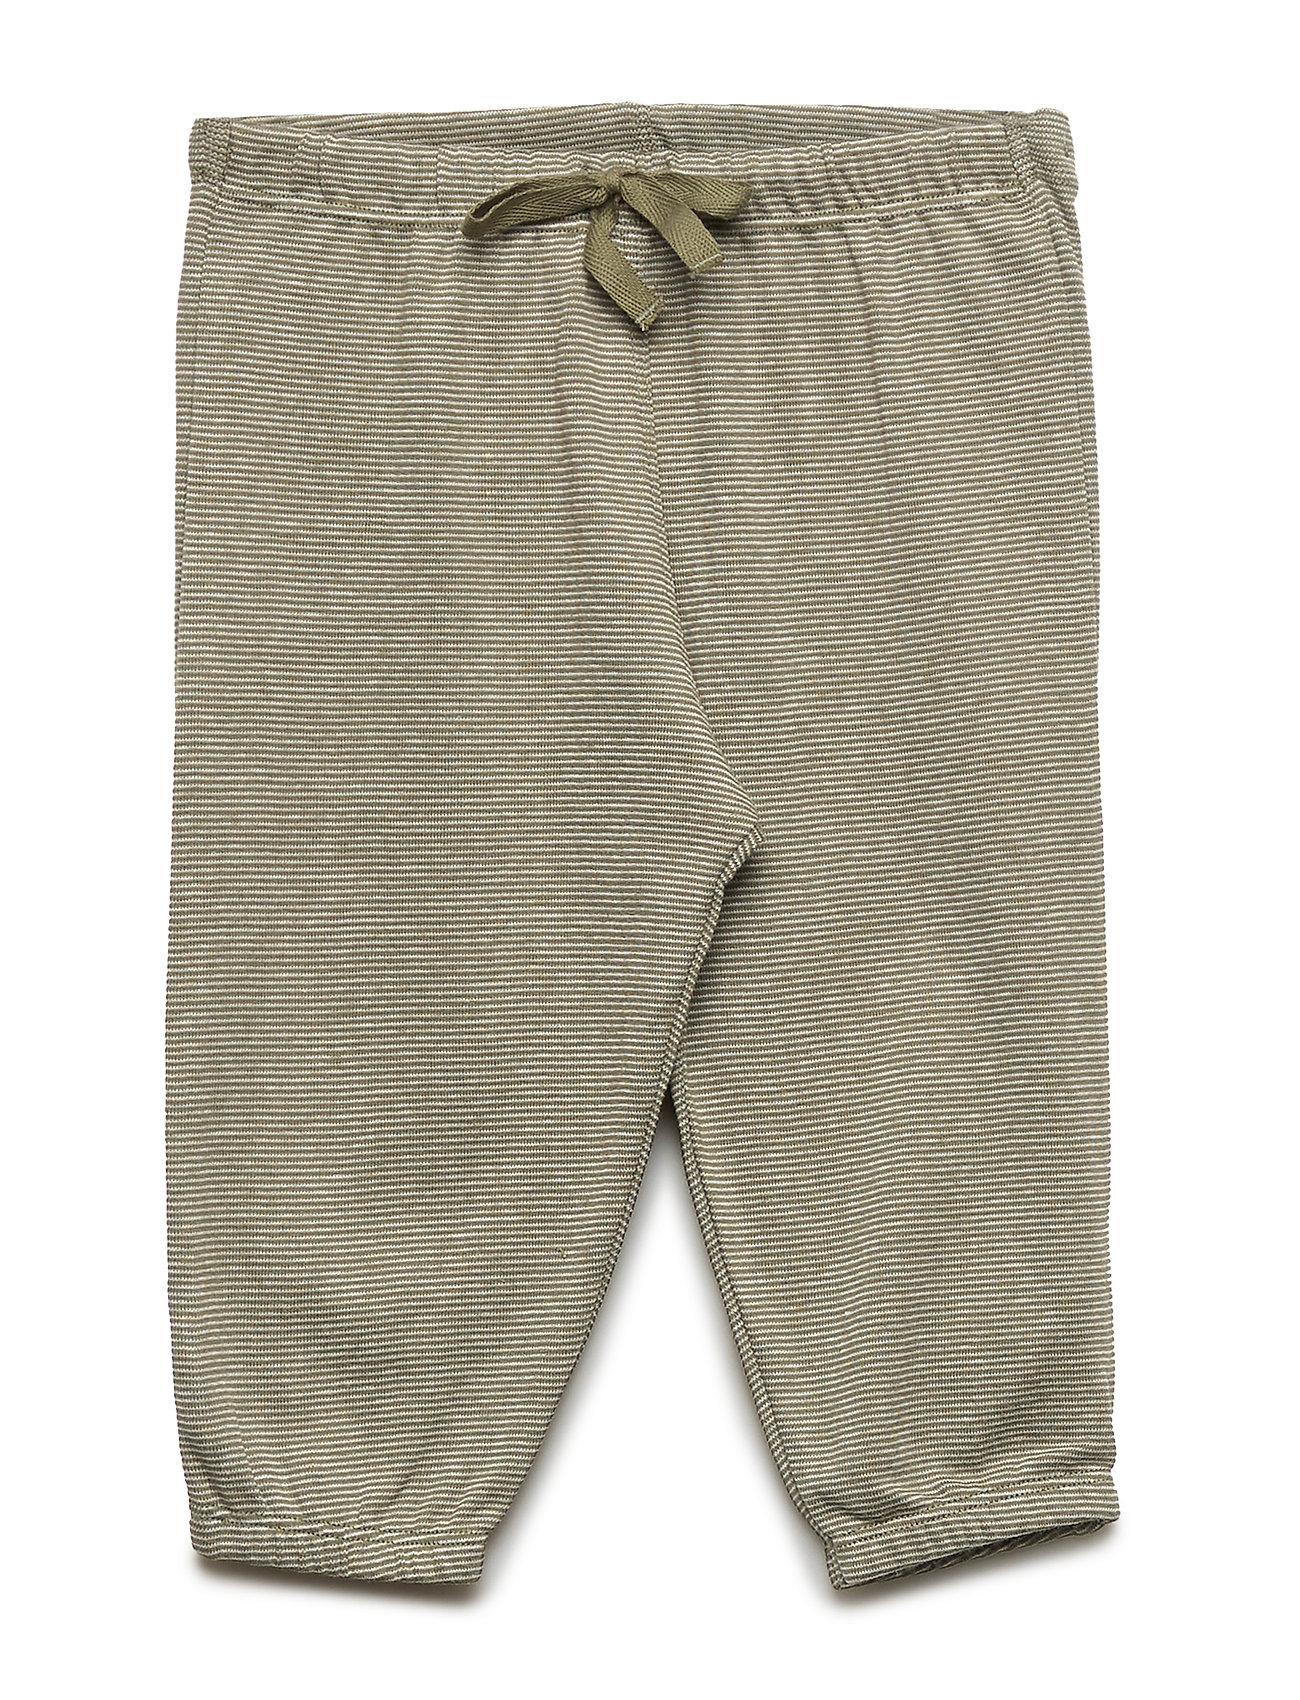 Image of Trousers Bukser Grå Noa Noa Miniature (3233523479)